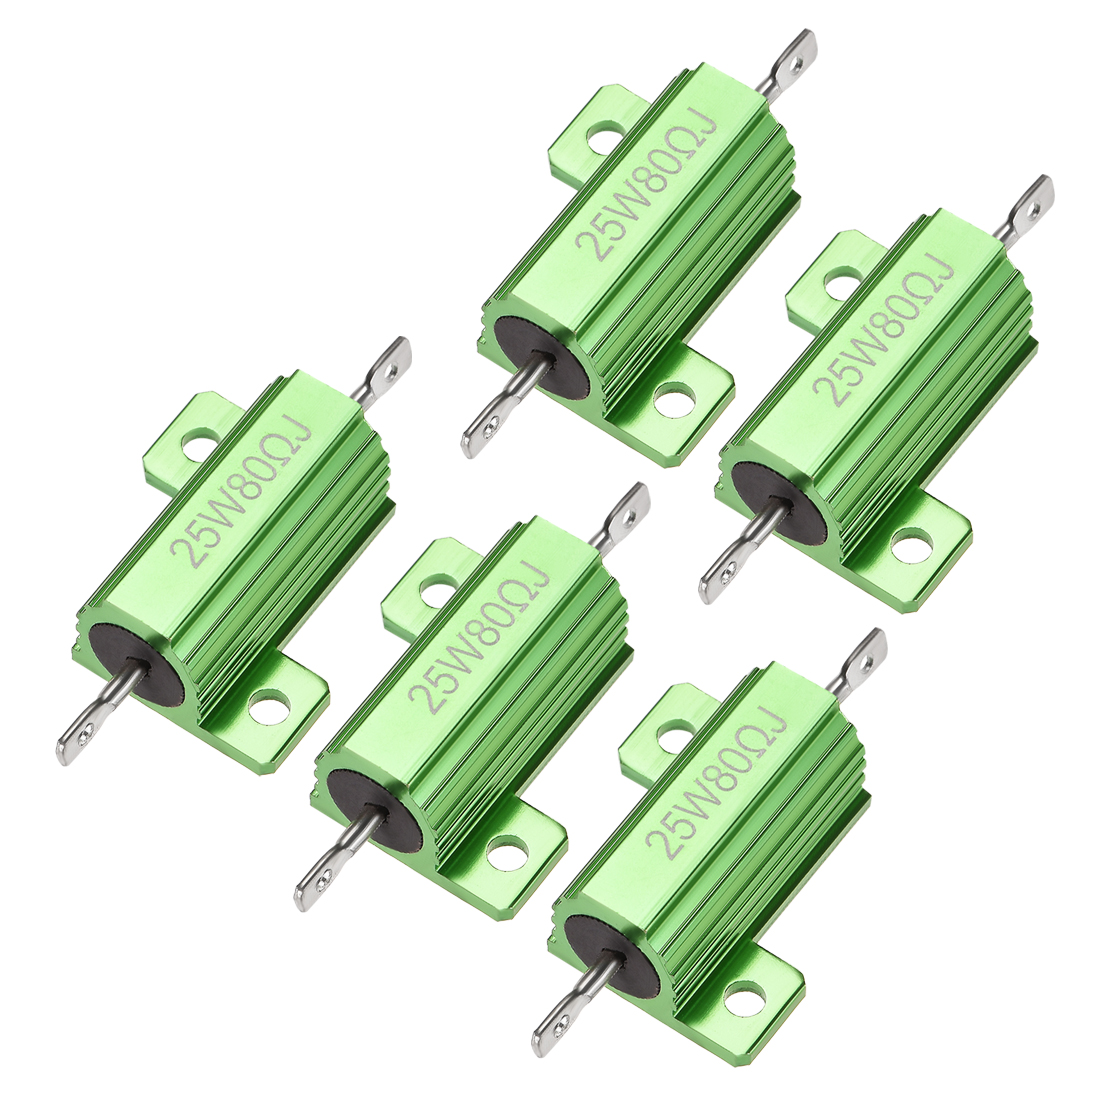 25W 80 Ohm 5% Aluminum Housing Resistor Wirewound Resistor Green Tone 5 Pcs